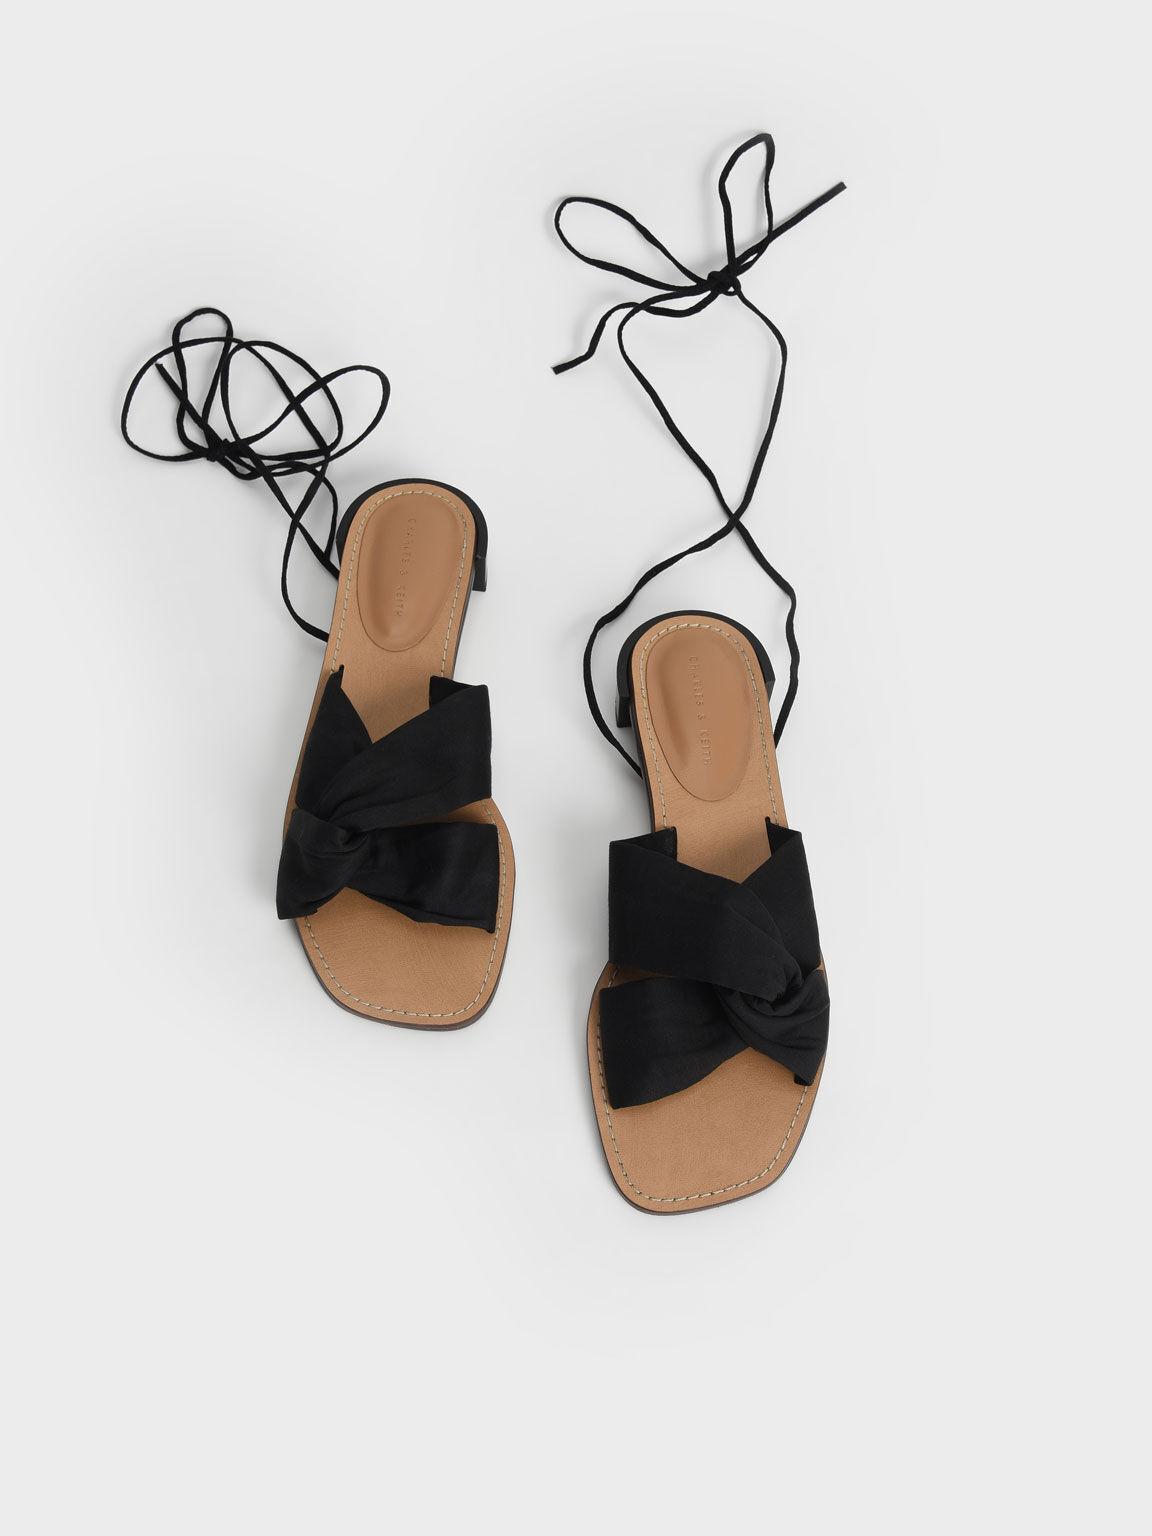 Knotted Tie-Around Sandals, Black, hi-res